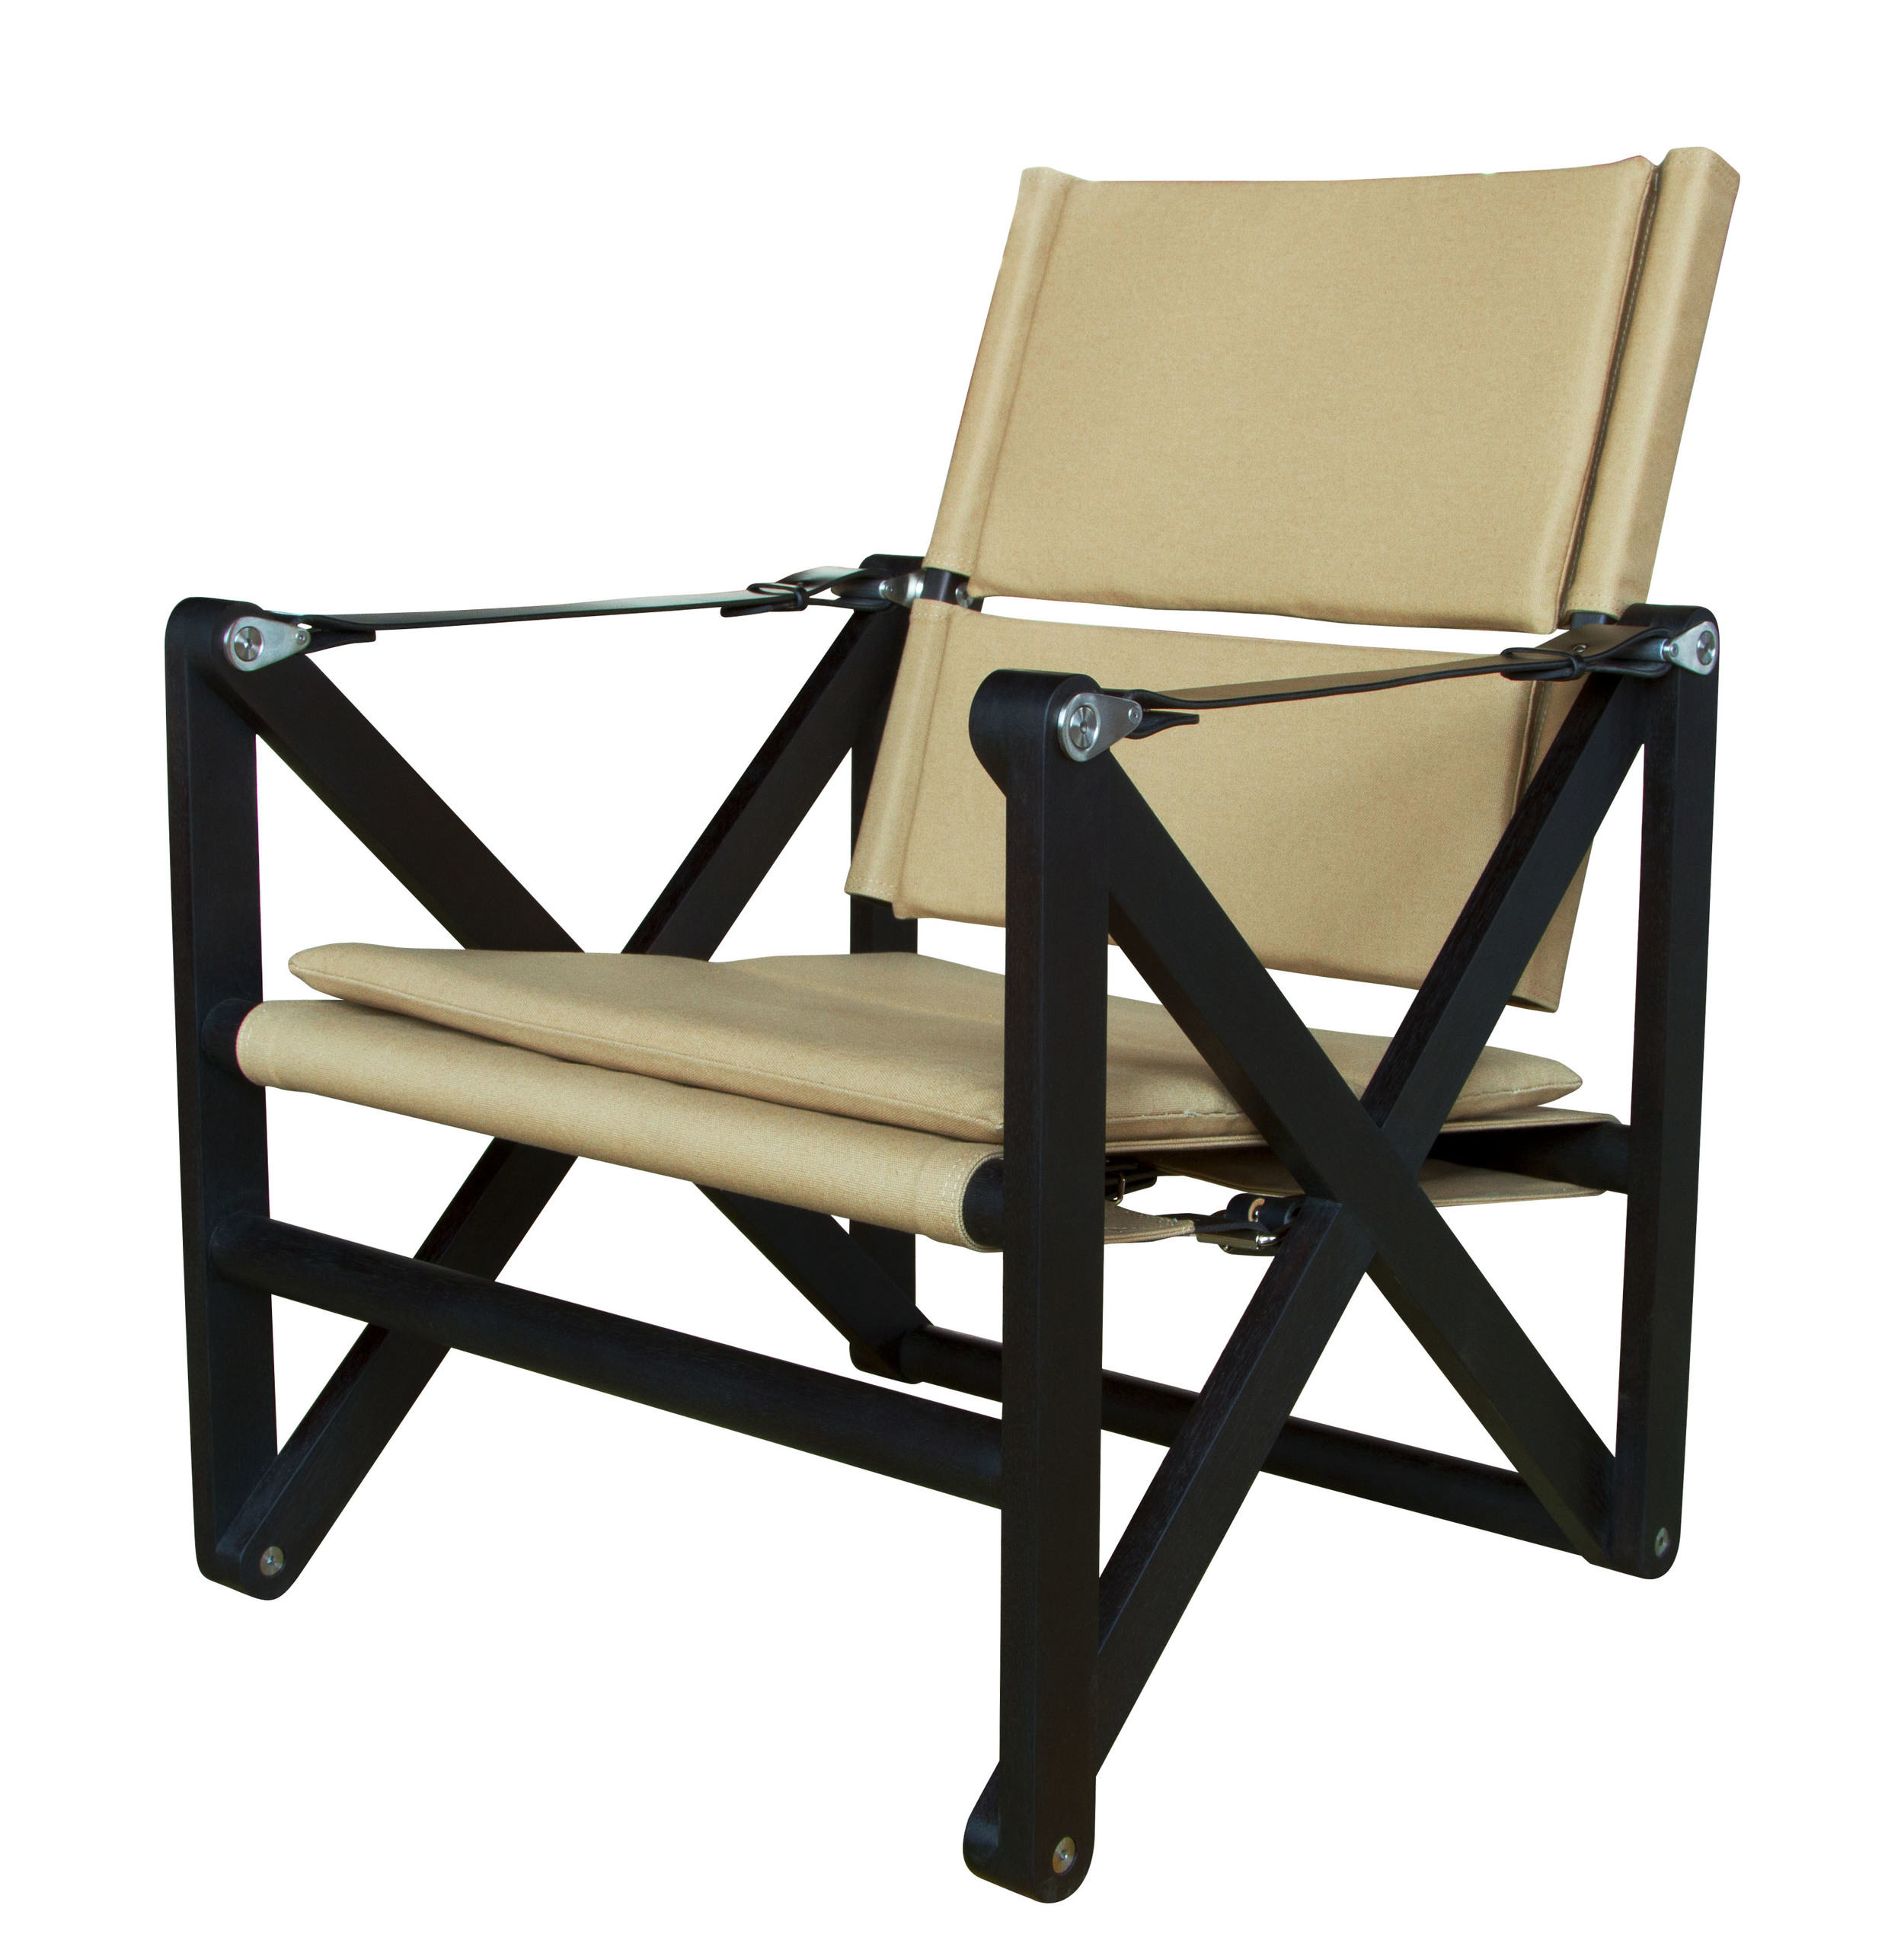 MacLaren Lounge Chair